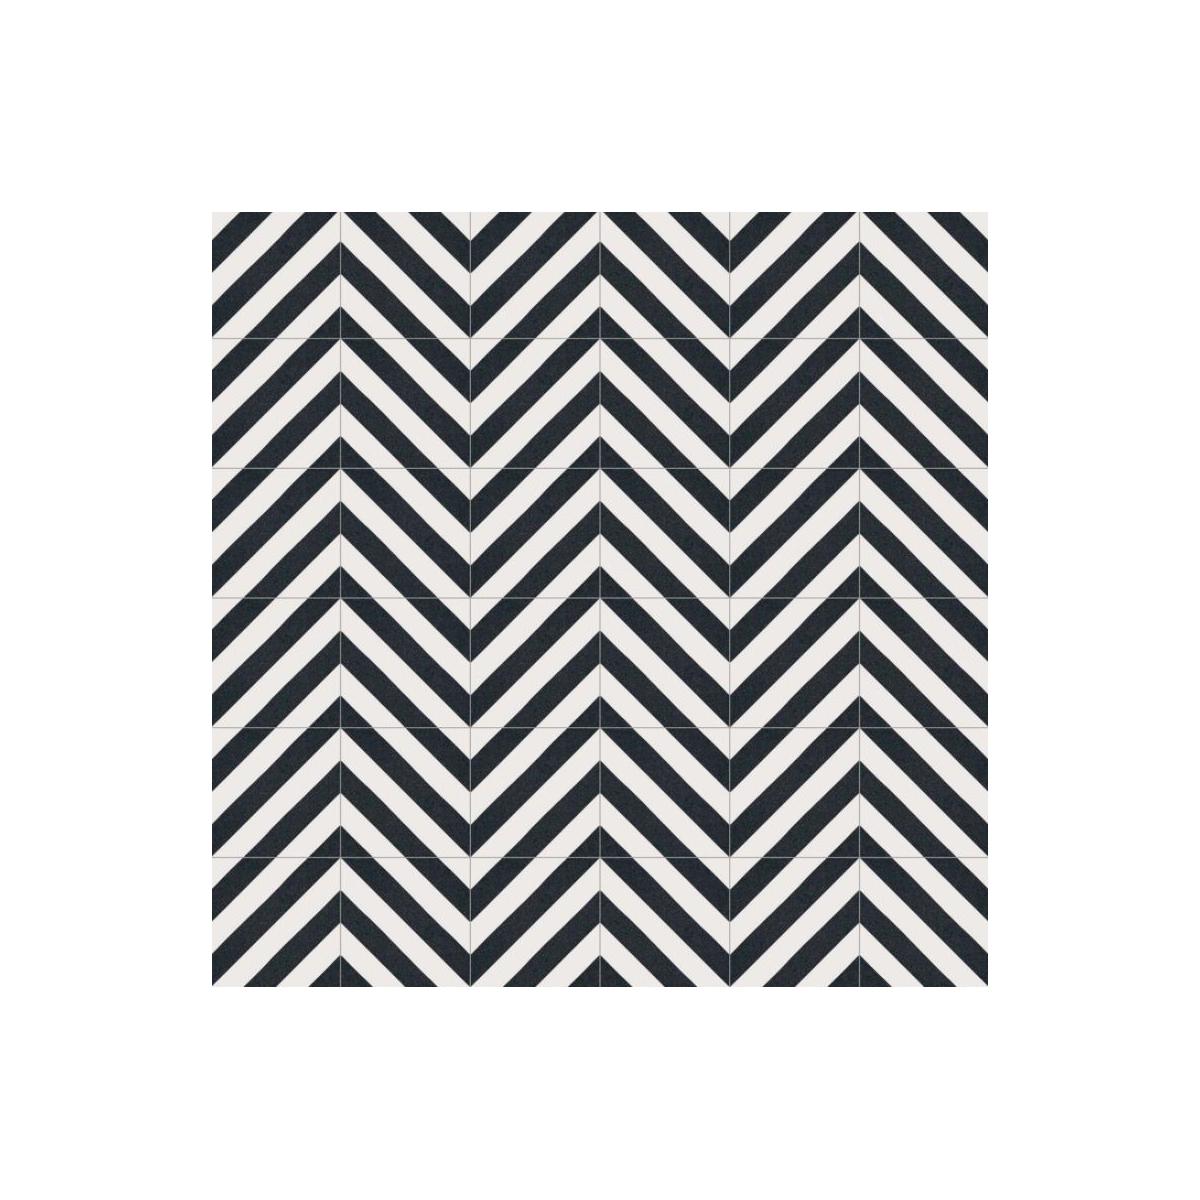 Goroka Grafito (m2) - Pavimento hidráulico Porcelánico para interior y exterior Vives Serie Maori